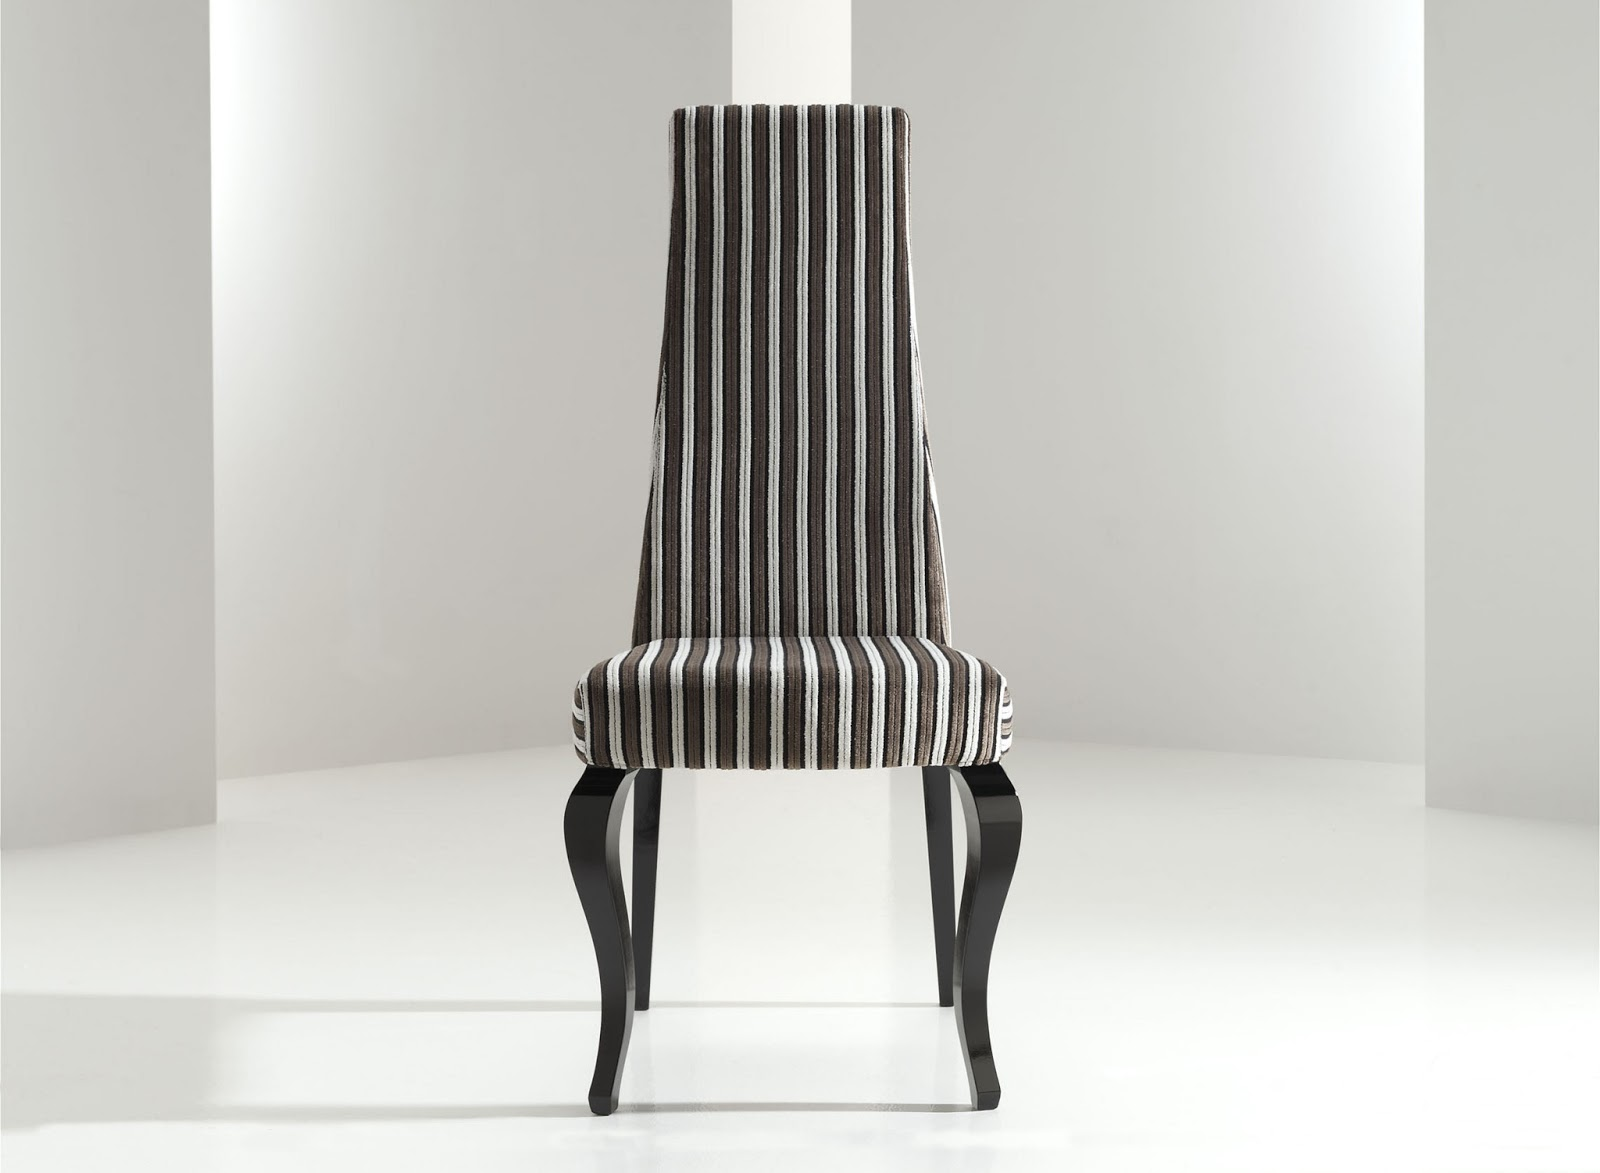 Decorando dormitorios lindas sillas de comedor tapizadas - Sillas para dormitorio moderno ...